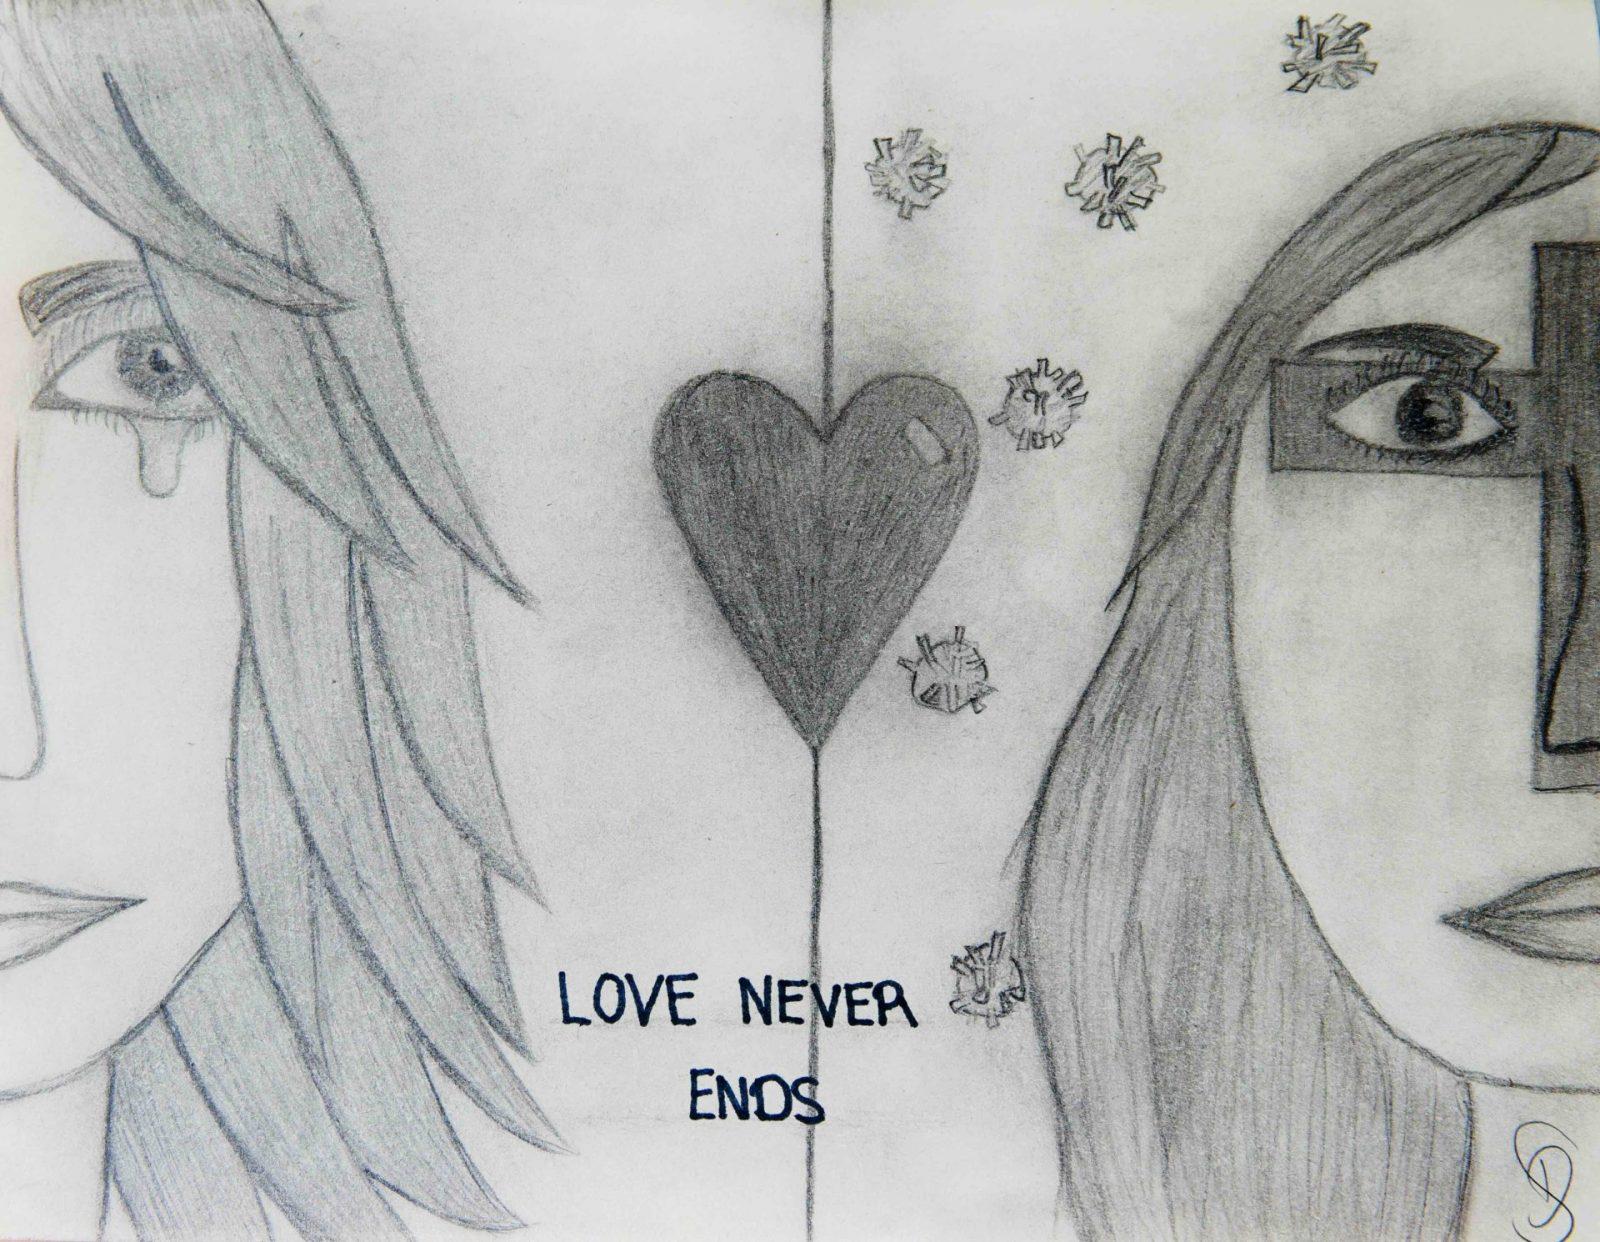 David Silberbach, Bleistiftzeichnung 'love never ends', 7.Kl.